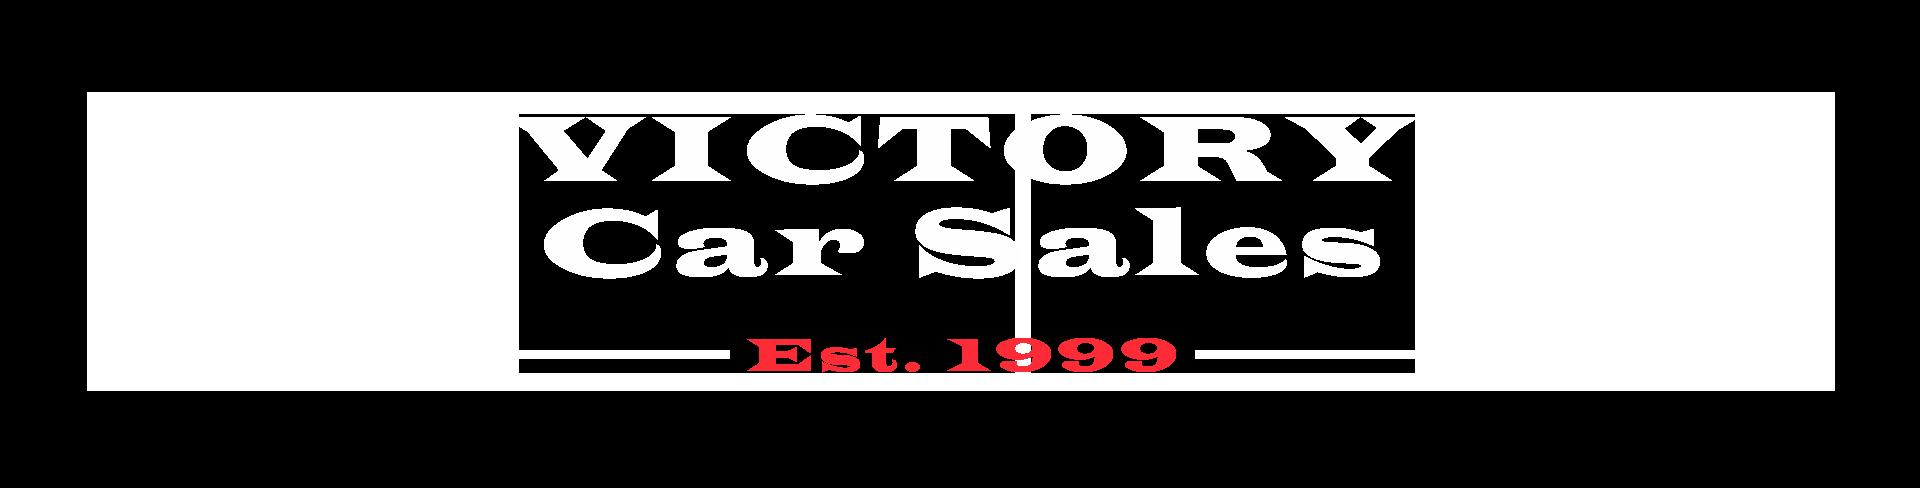 Victory Car Sales Ltd